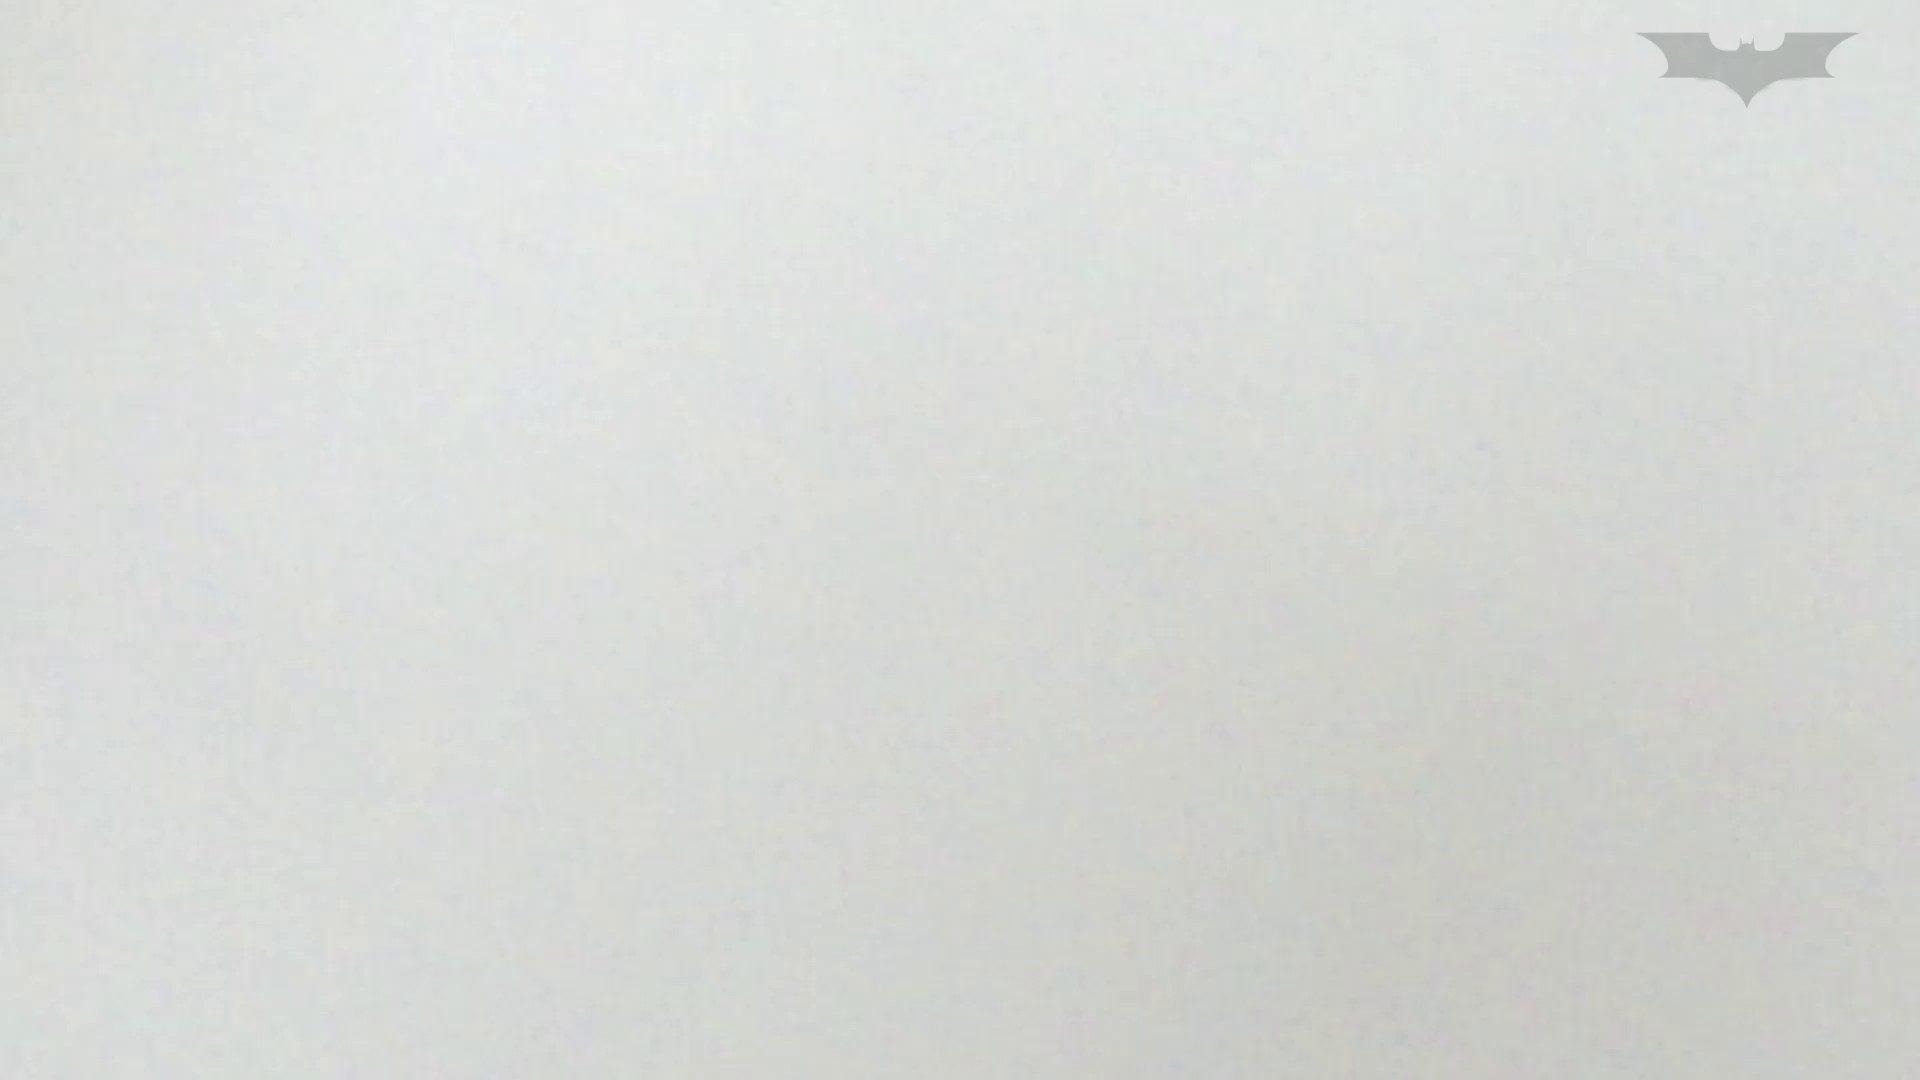 JD盗撮 美女の洗面所の秘密 Vol.66 洗面所のぞき AV無料動画キャプチャ 110枚 60